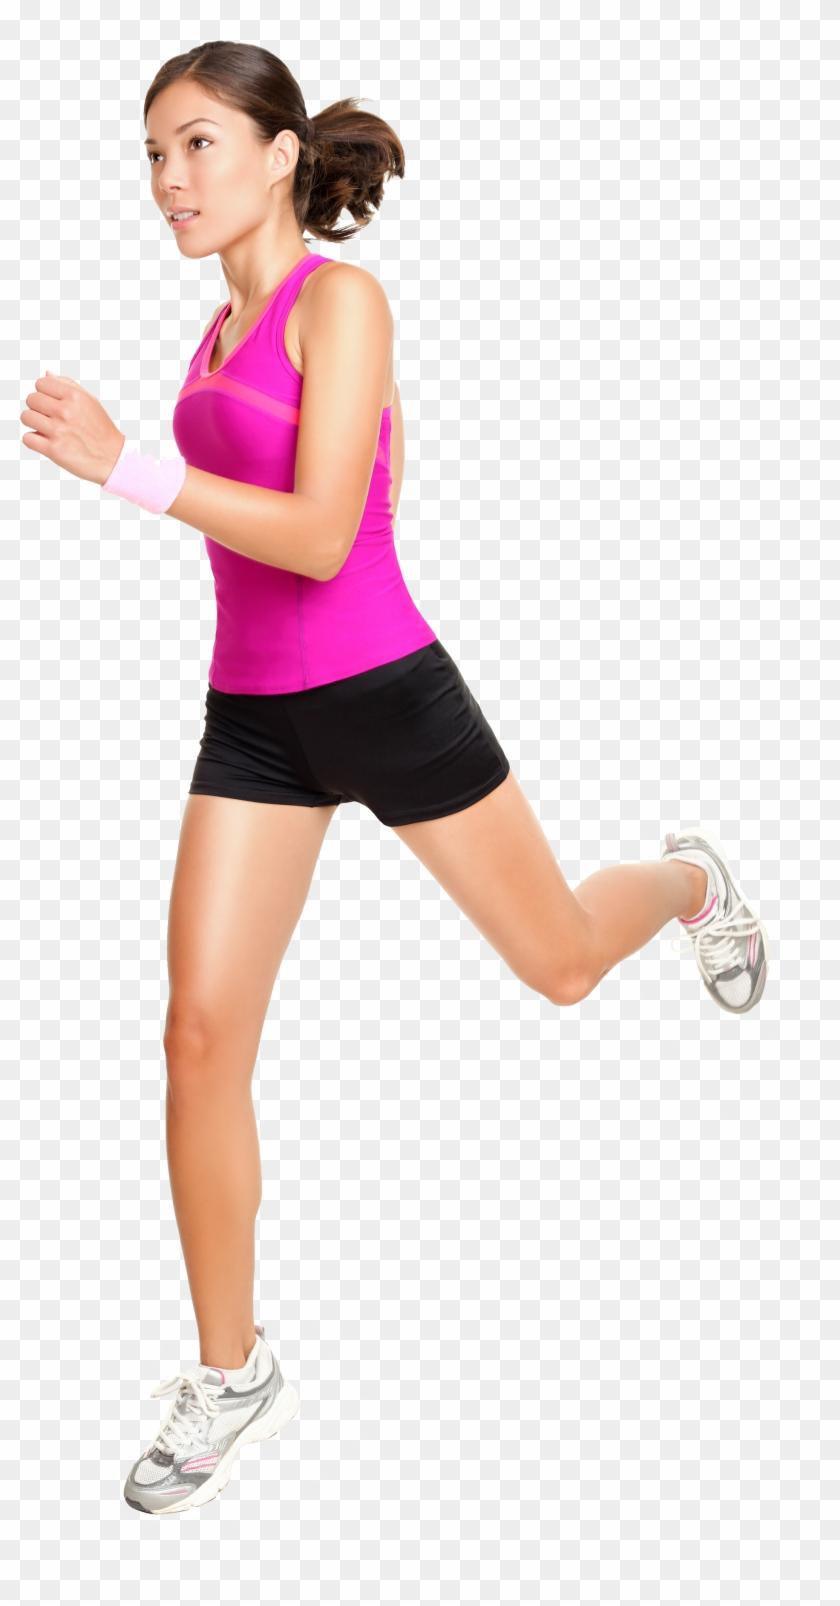 Running Girl Png Image.